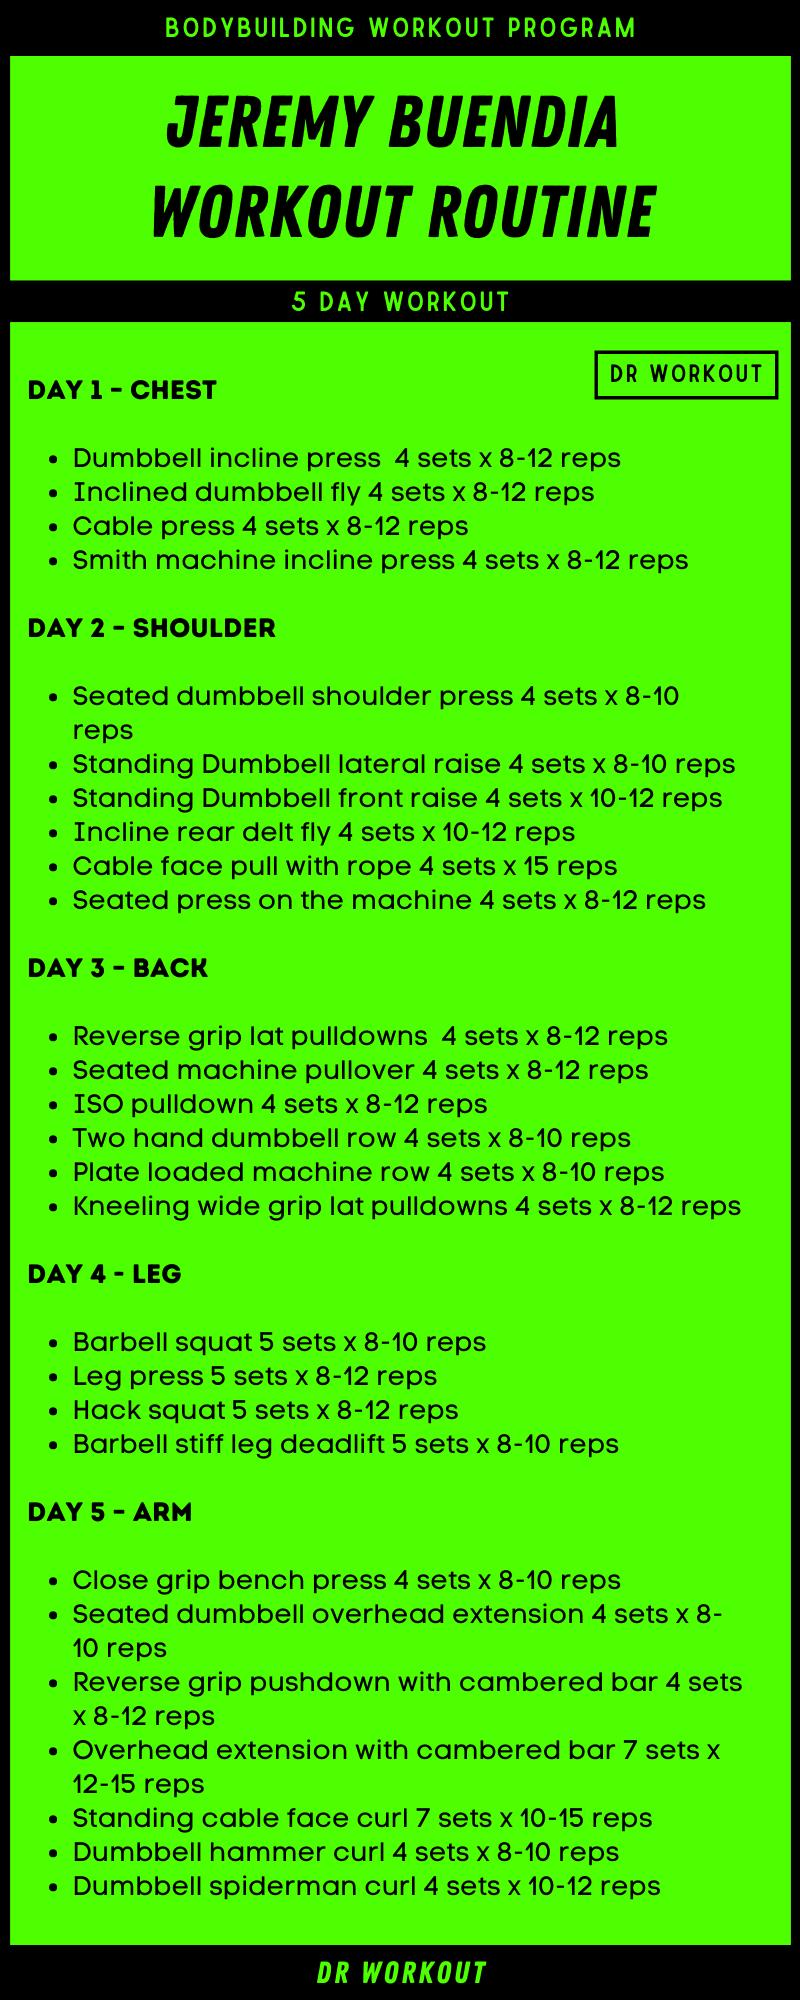 Jeremy Buendia Workout Routine